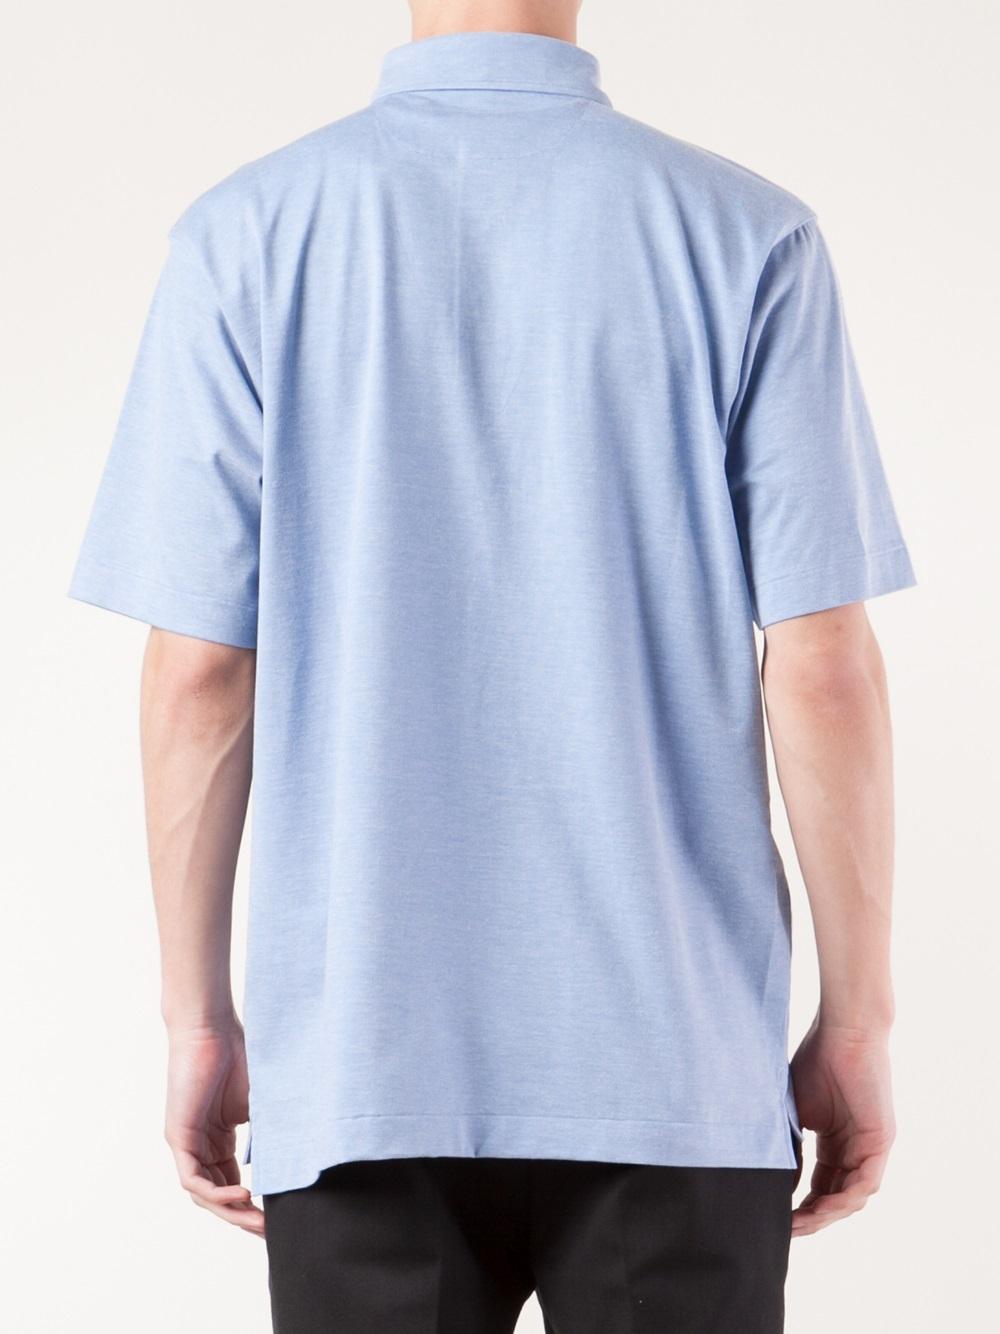 ermenegildo zegna polo shirt in blue for men lyst. Black Bedroom Furniture Sets. Home Design Ideas